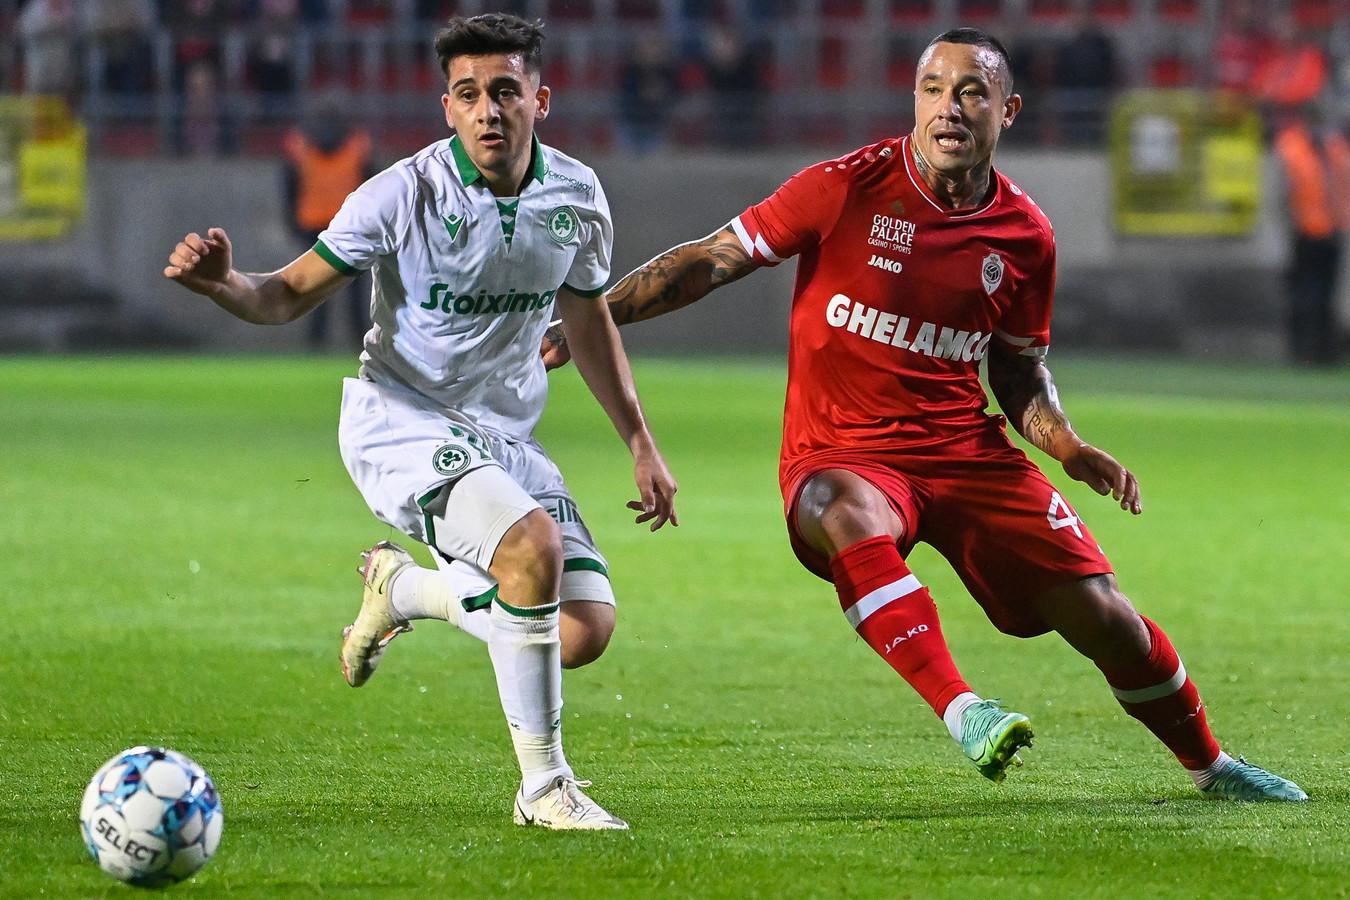 Loizos Loizou nam het gisteren nog op tegen Antwerp en Radja Nainggolan.